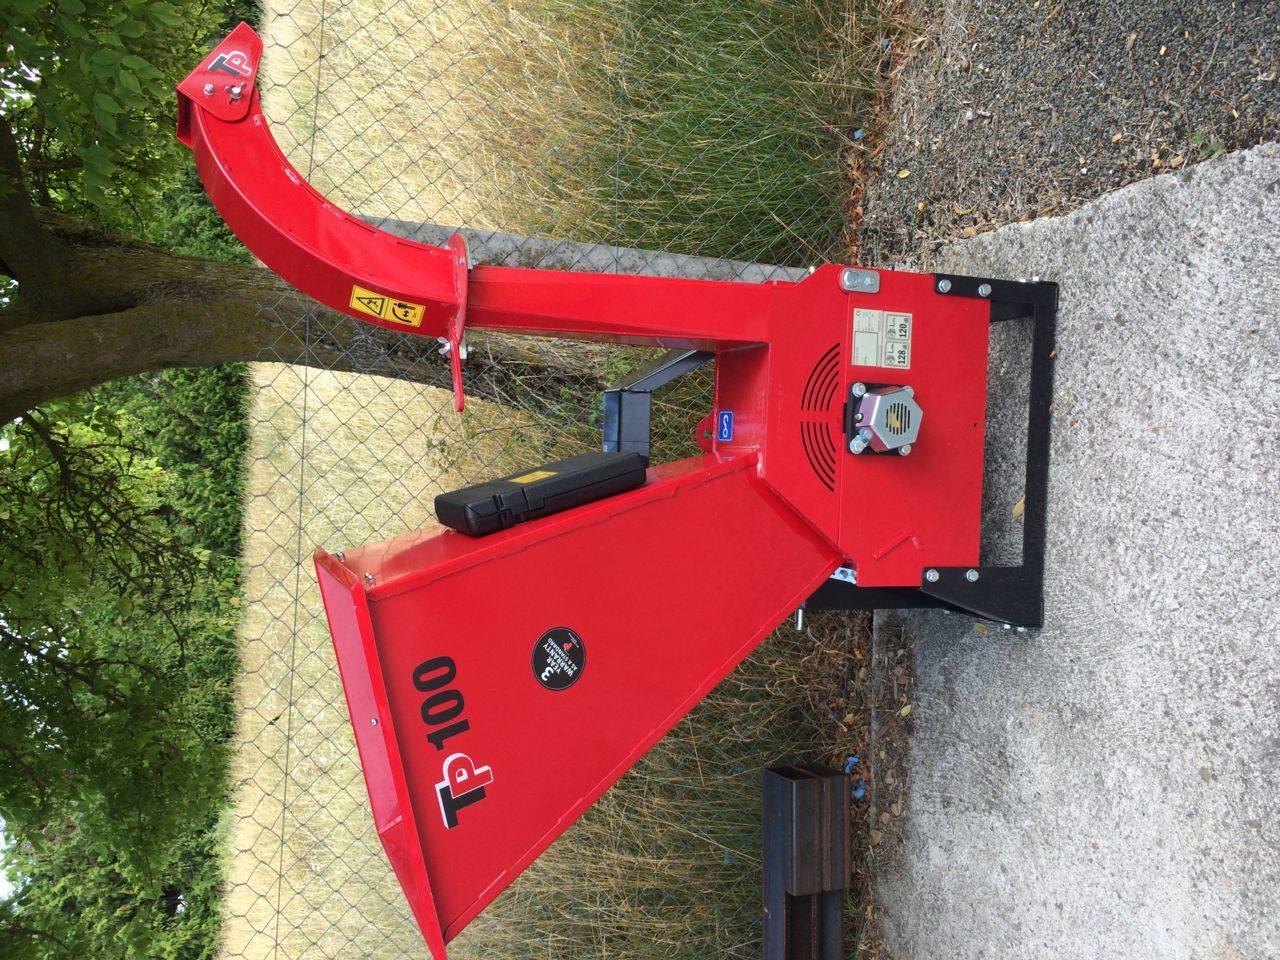 Broyeur de branches derri re tracteur diam tre 100 mm - Broyeur a branche ...